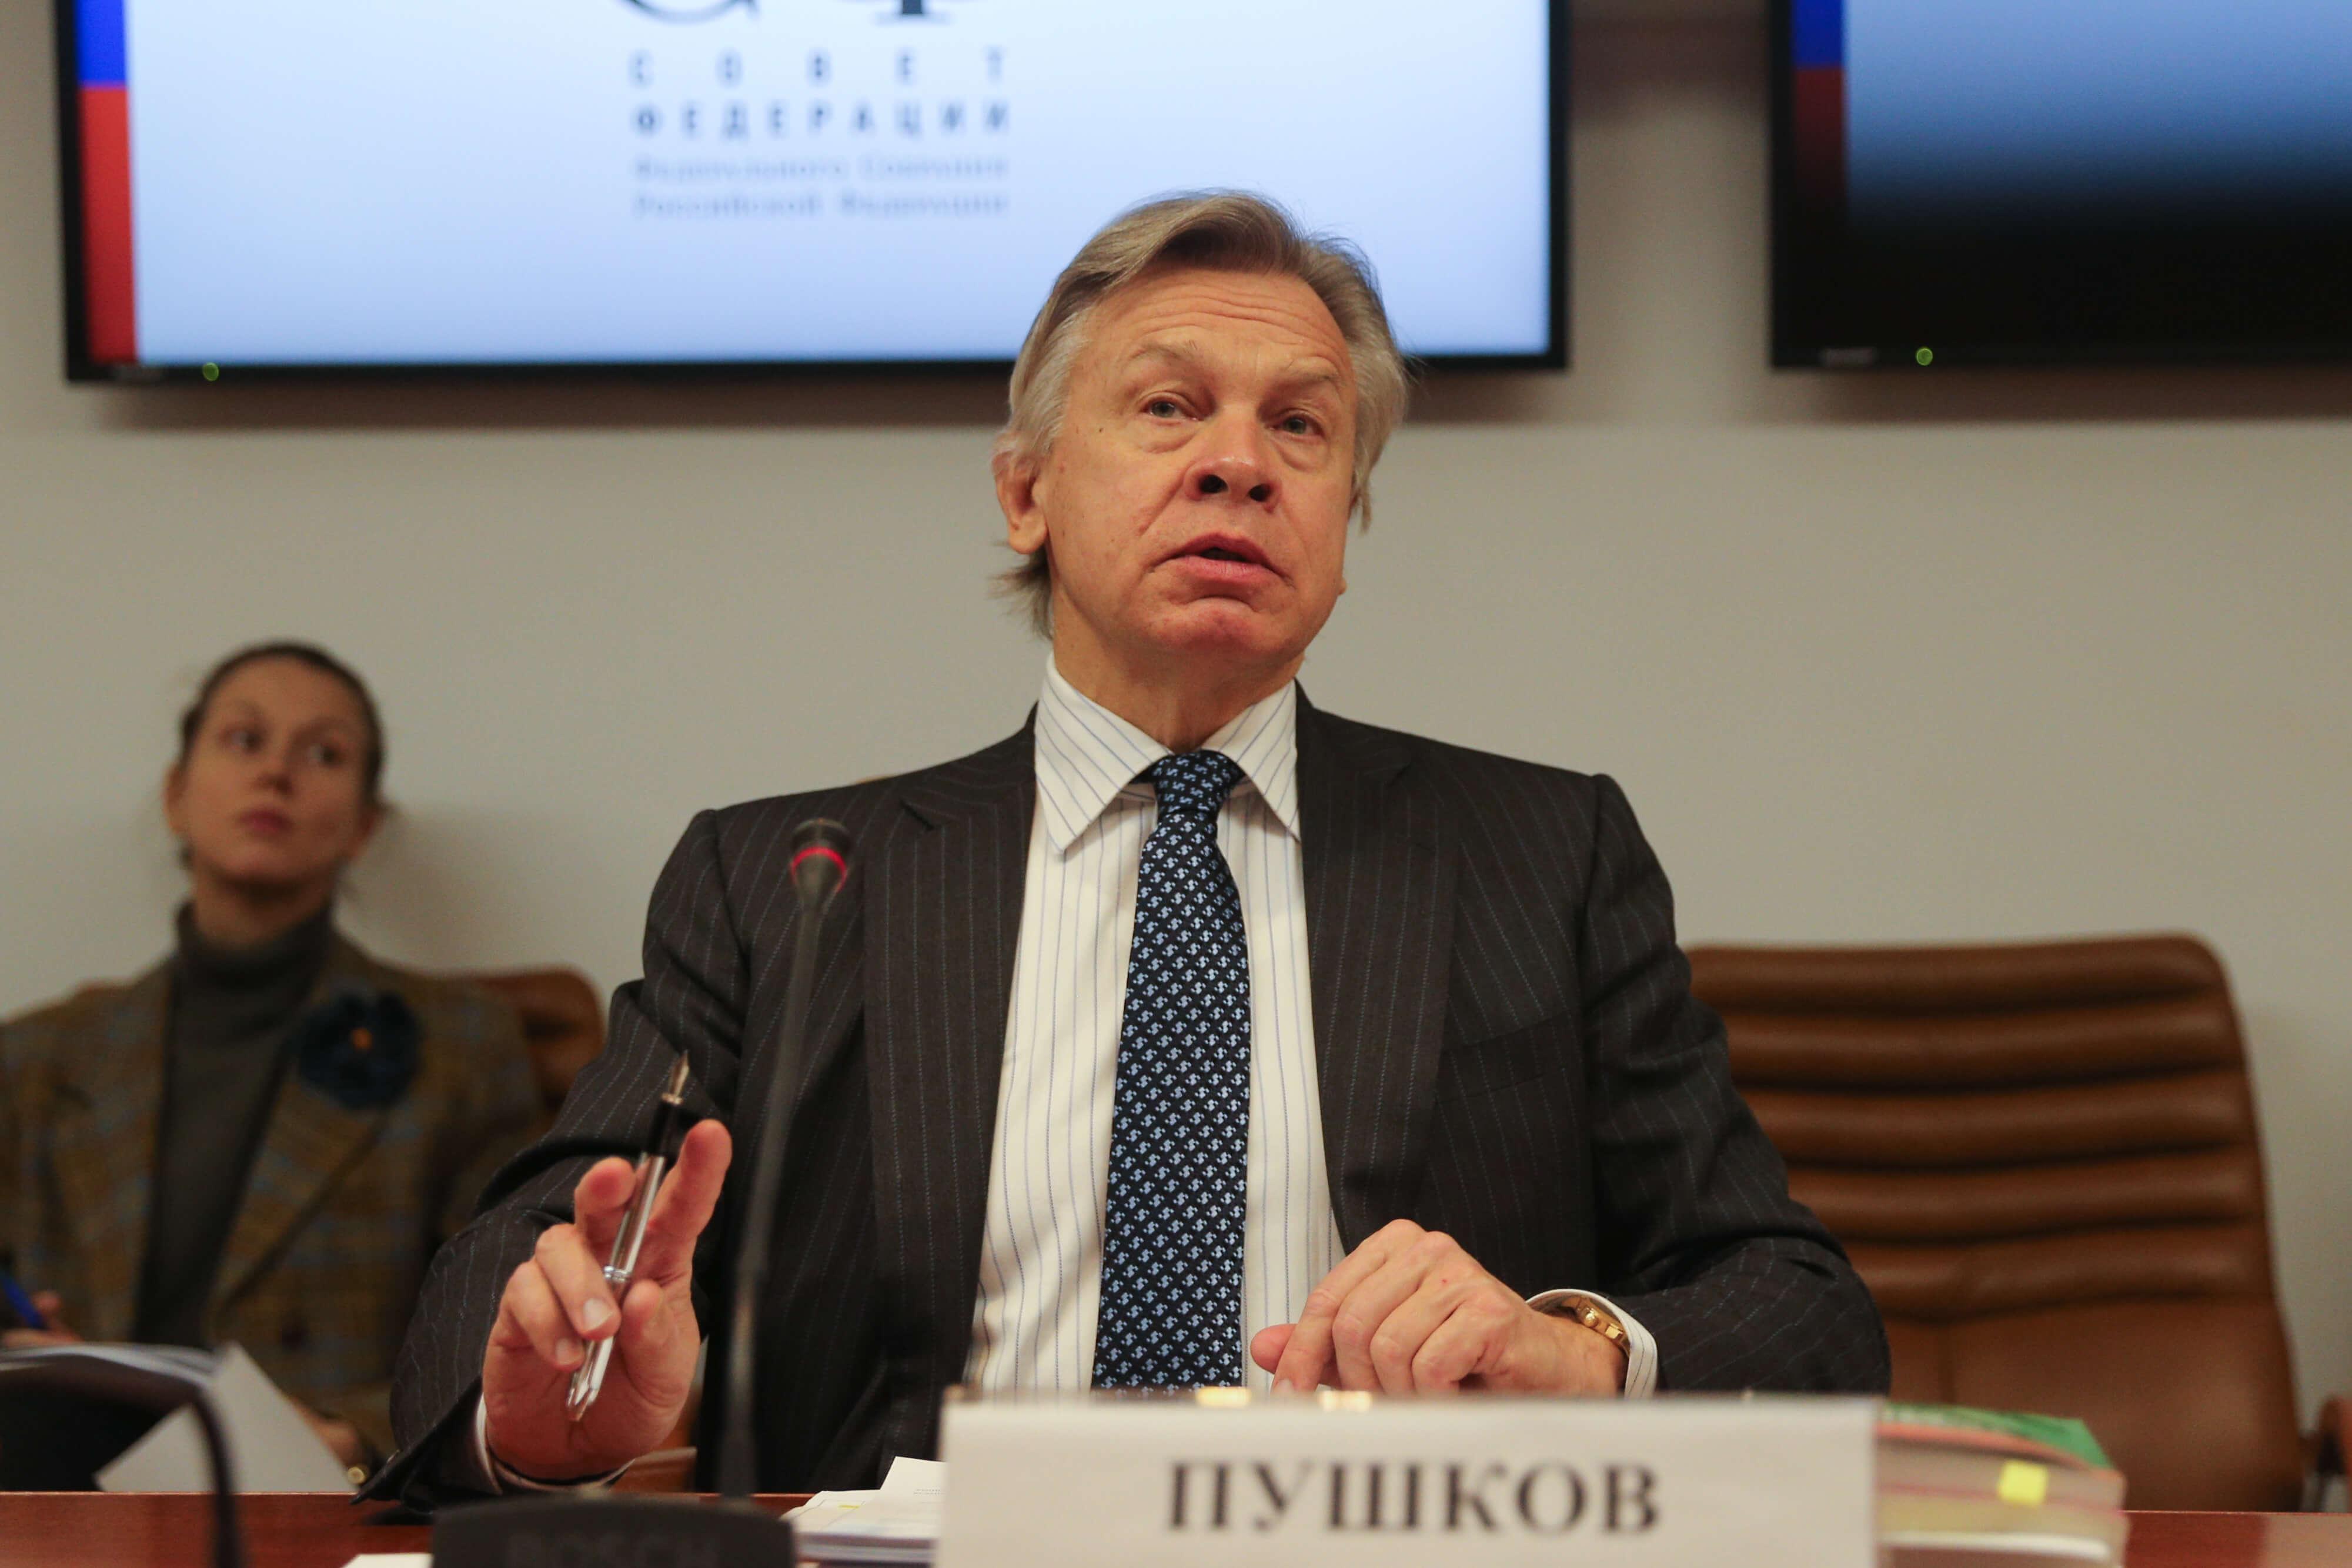 Federation Council of Russia/Globallookpress.com